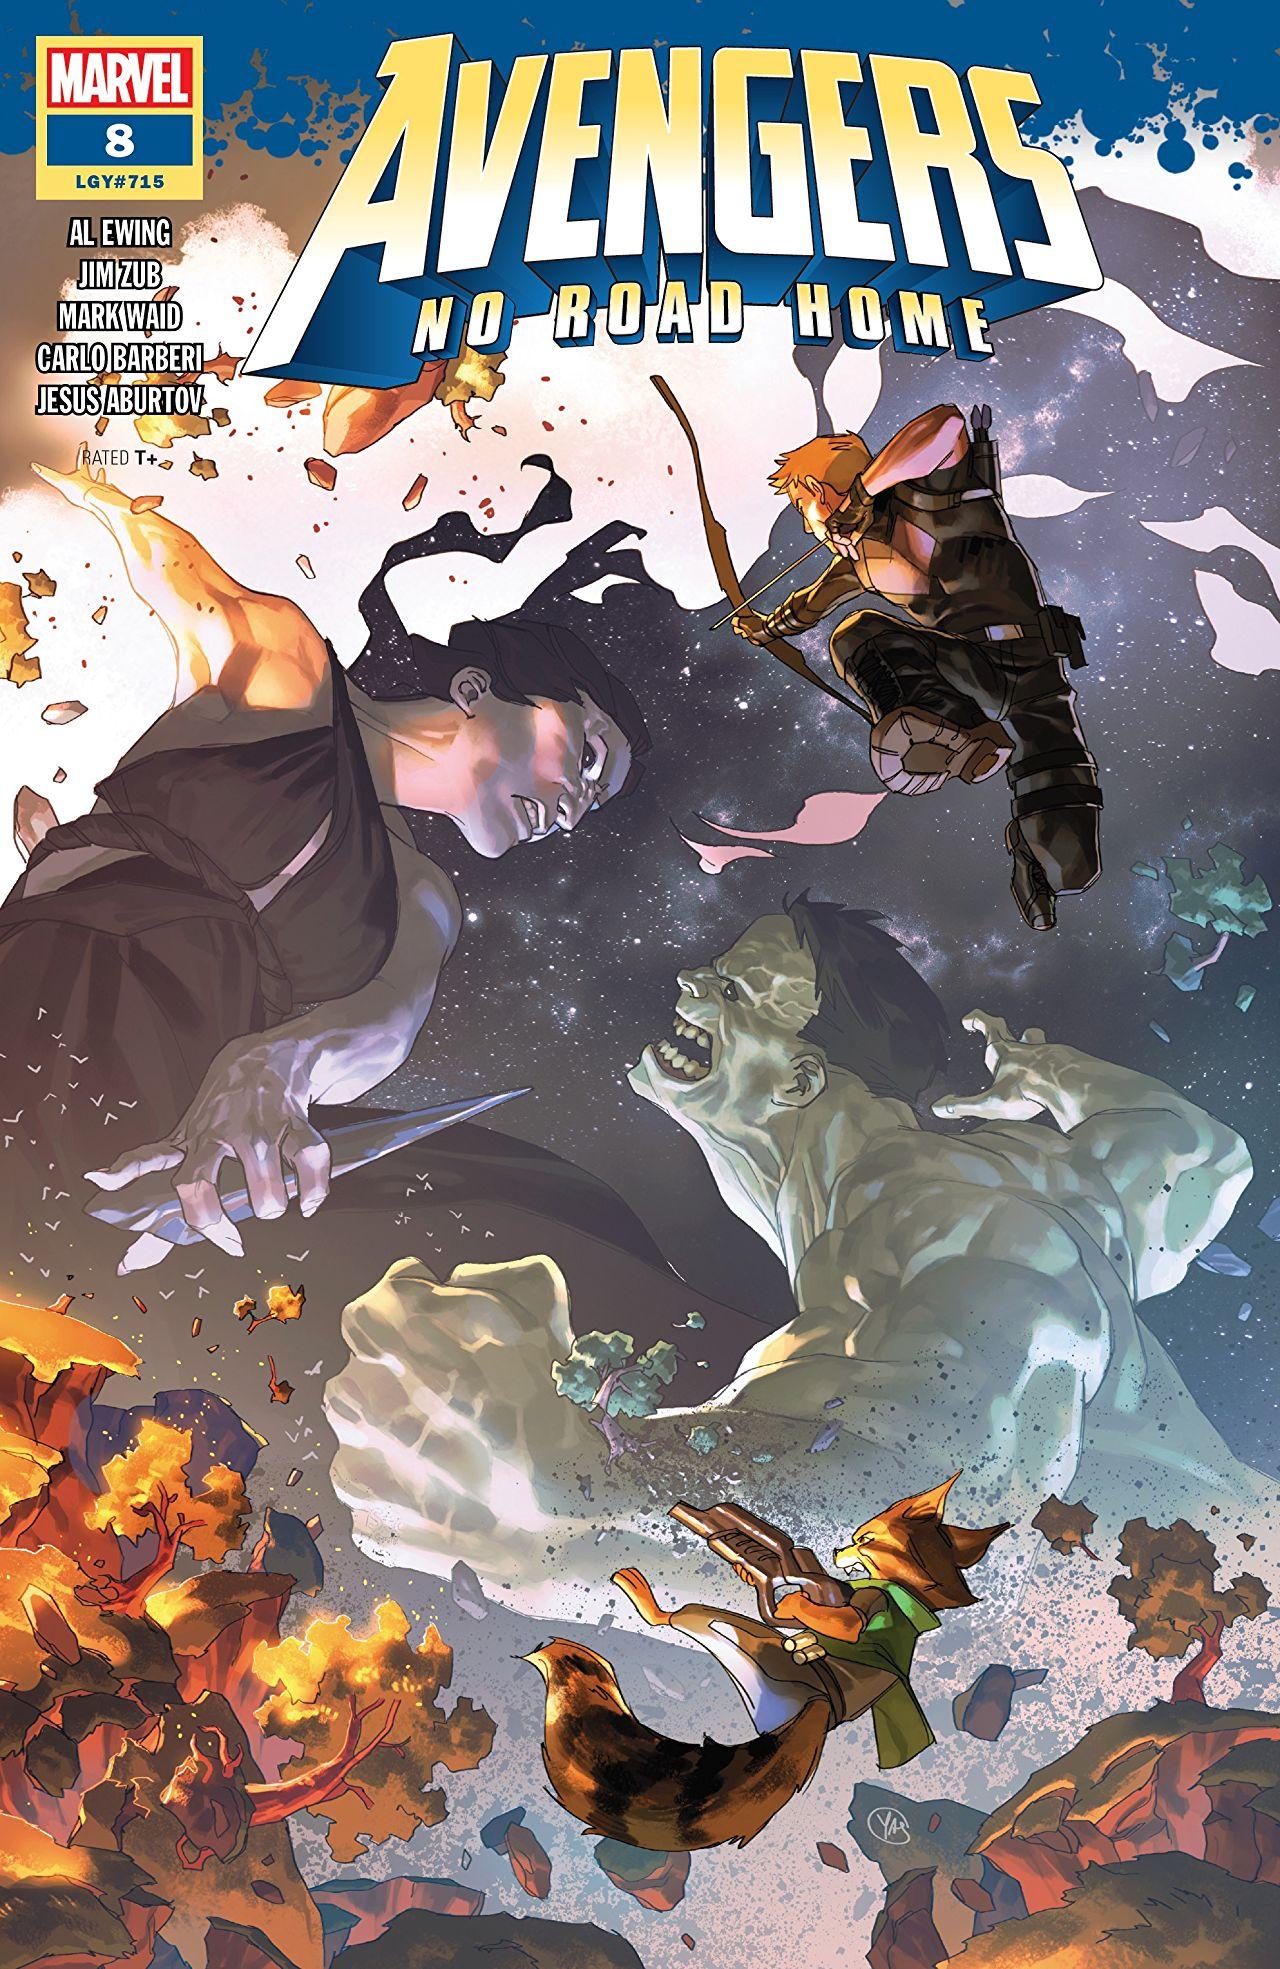 Avengers - No Road Home 8